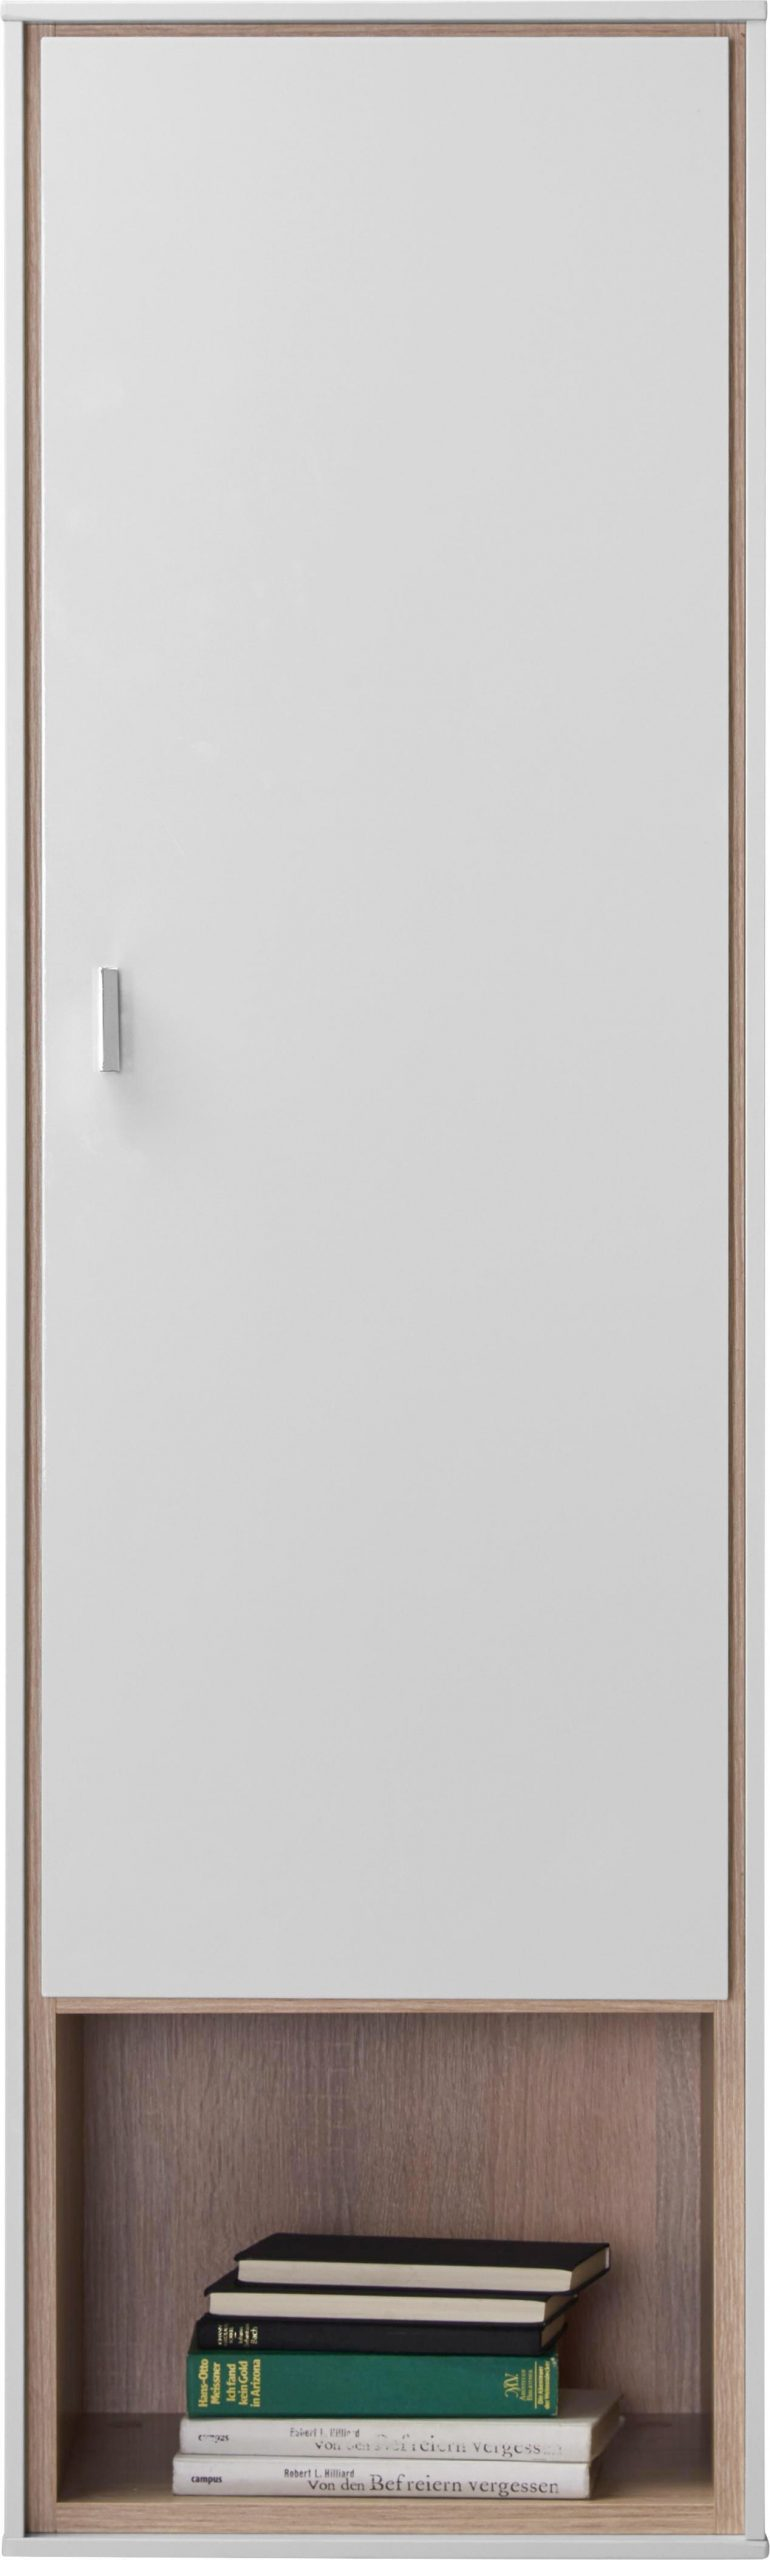 2/136/35 cm